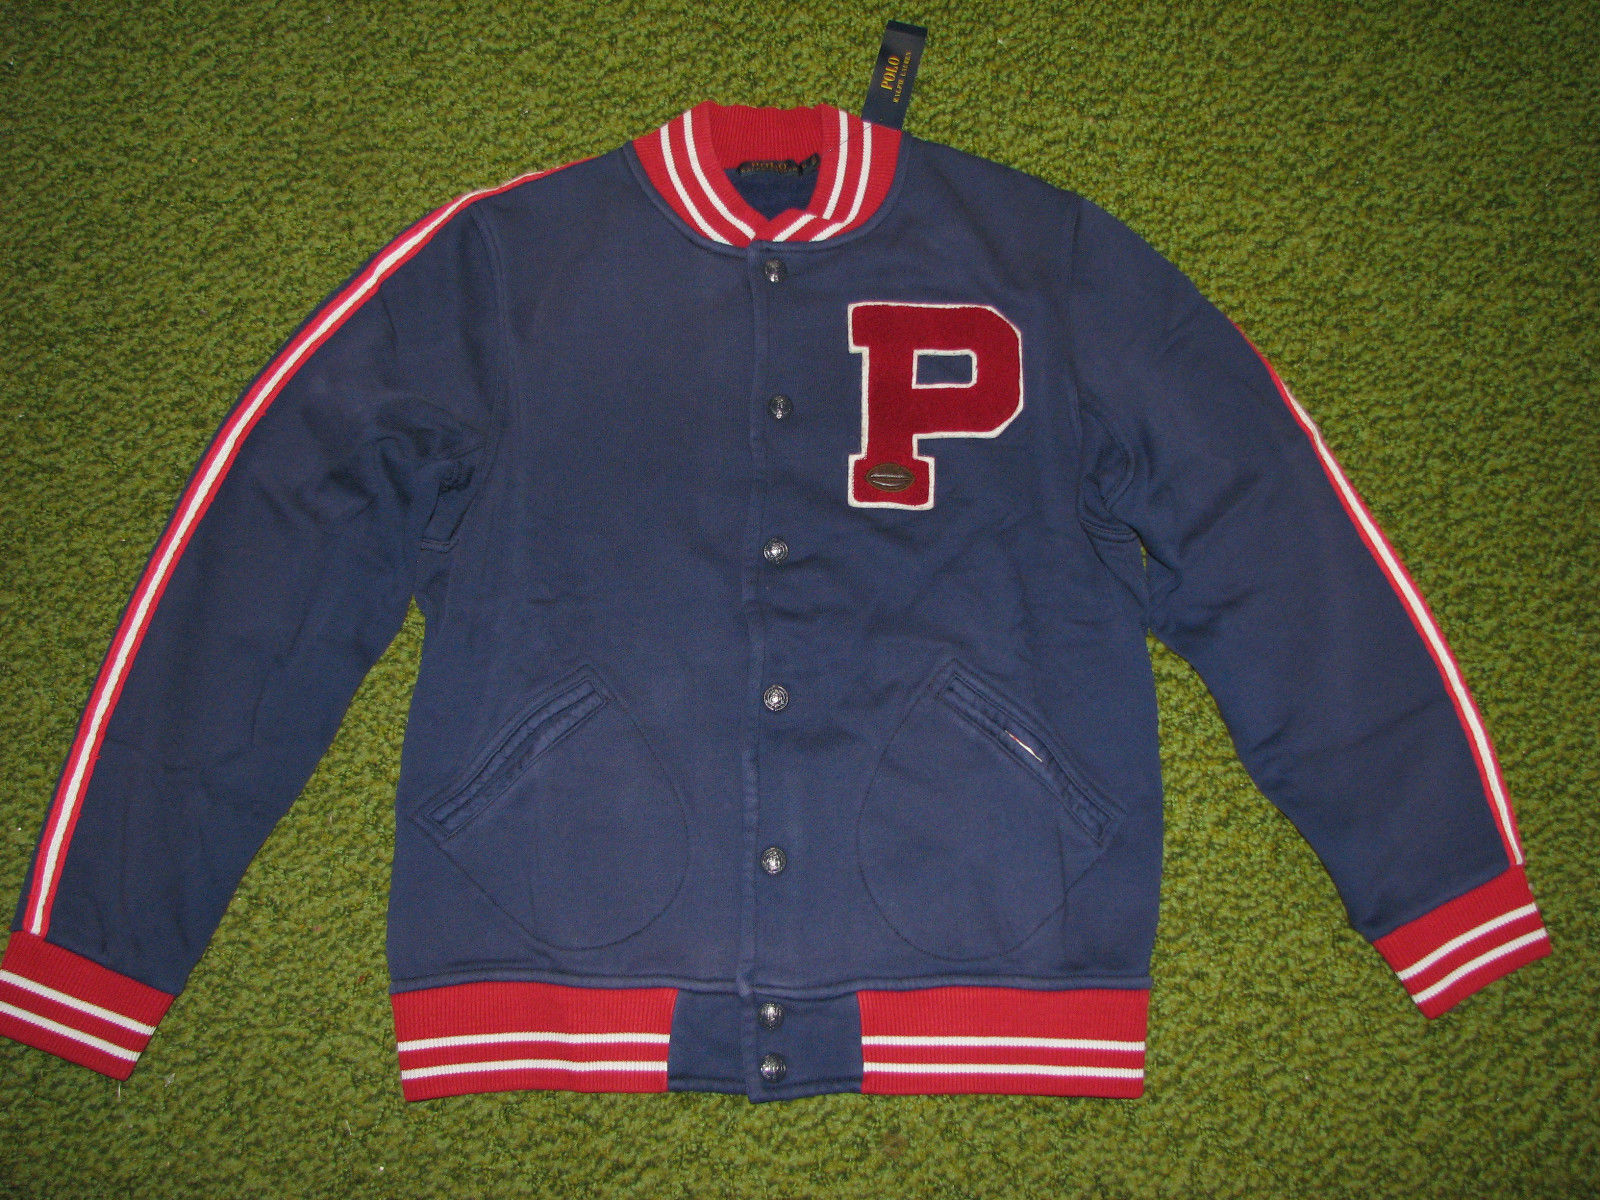 How to Make a Baseball Jacket | eBay